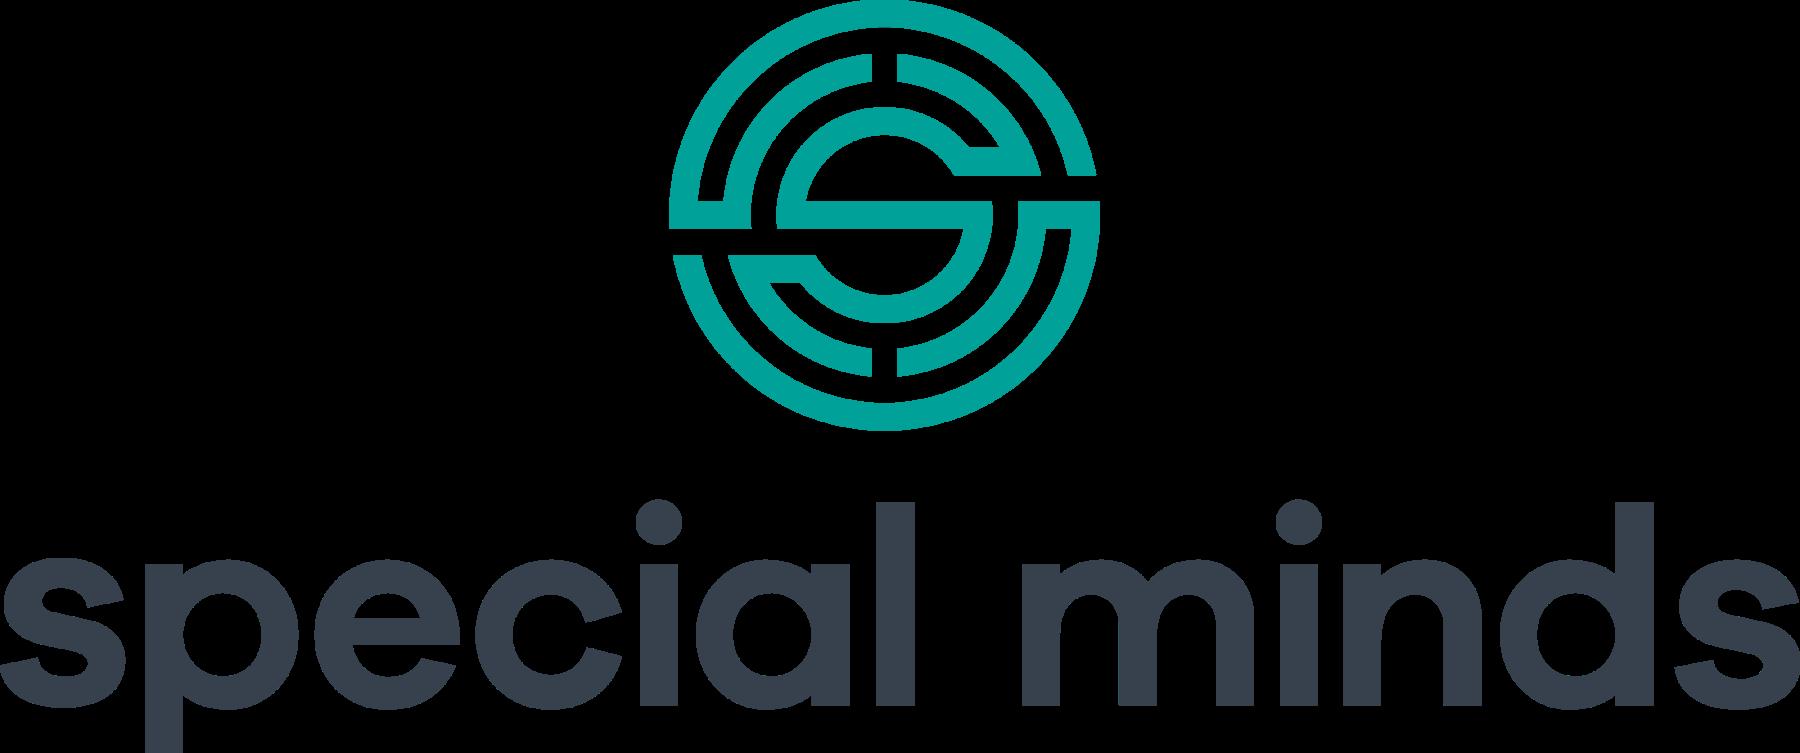 special-minds-logo.png